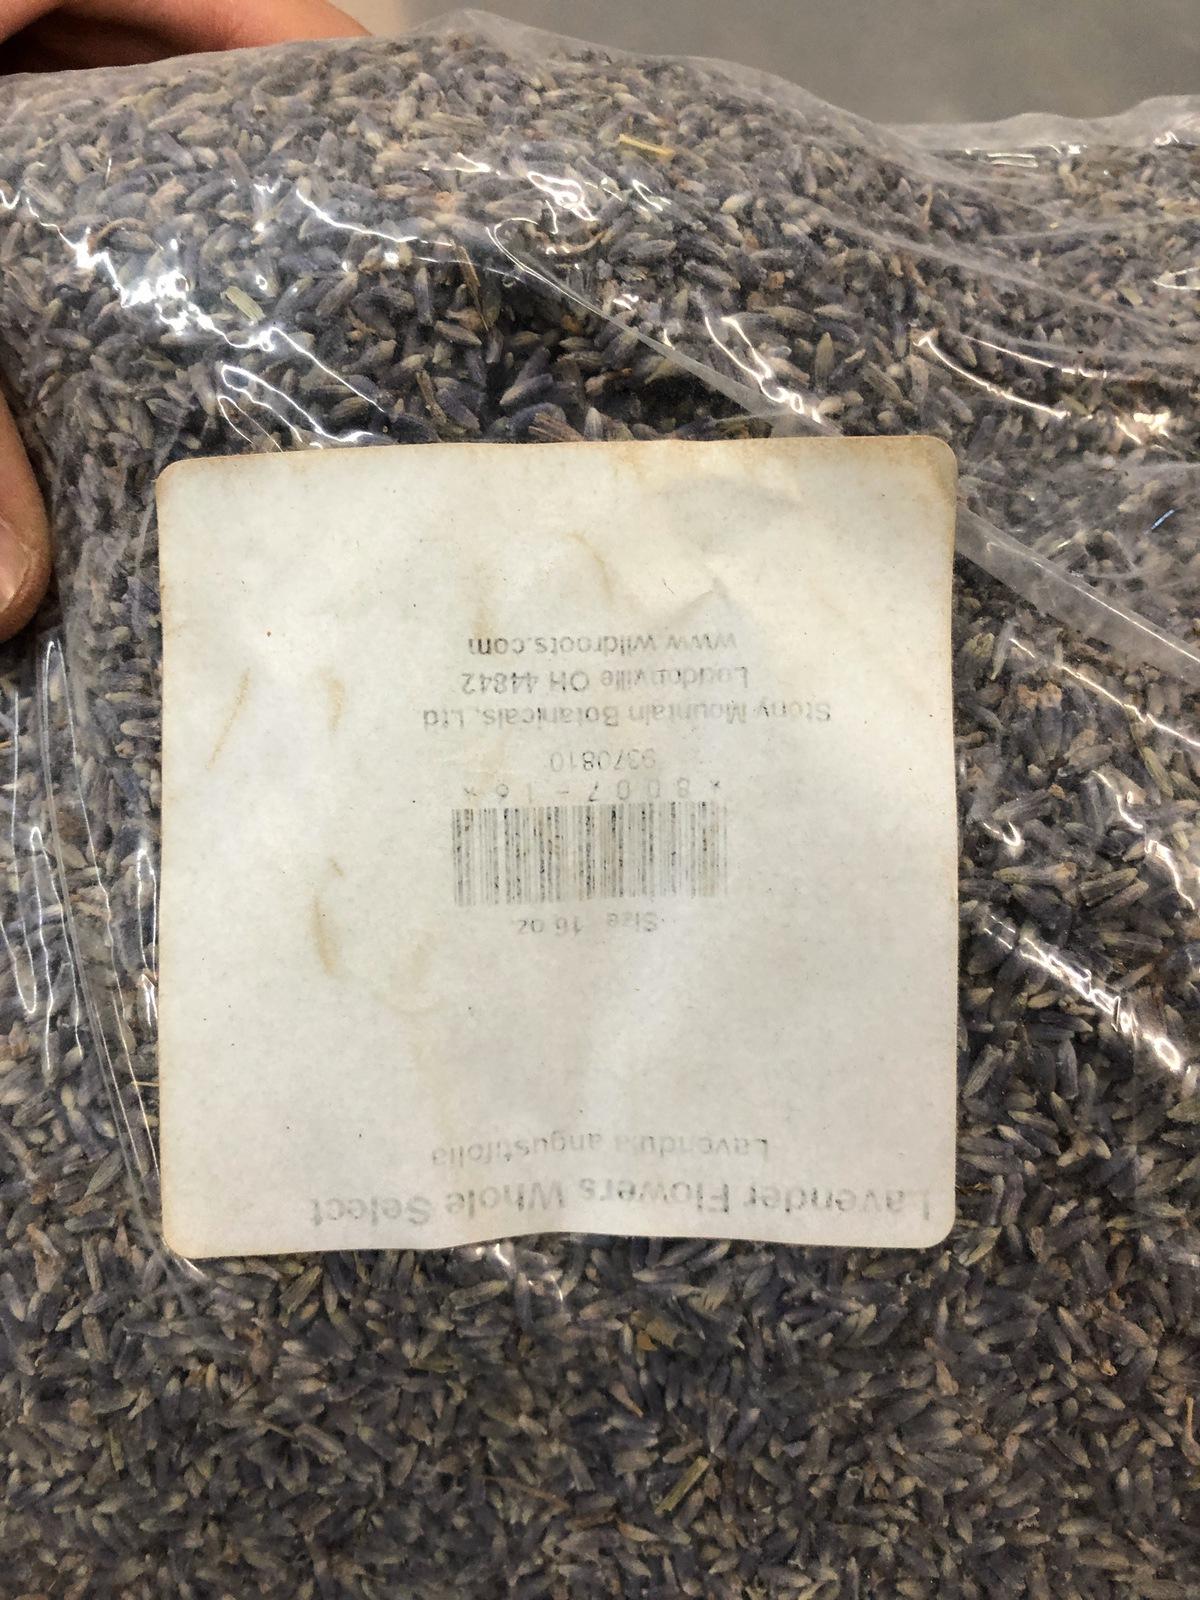 Lot of Herbs and Botanicals: Orange Peel, Peppermint Leaf, Cinchona Bark, Caraw | Rig Fee: $20 or HC